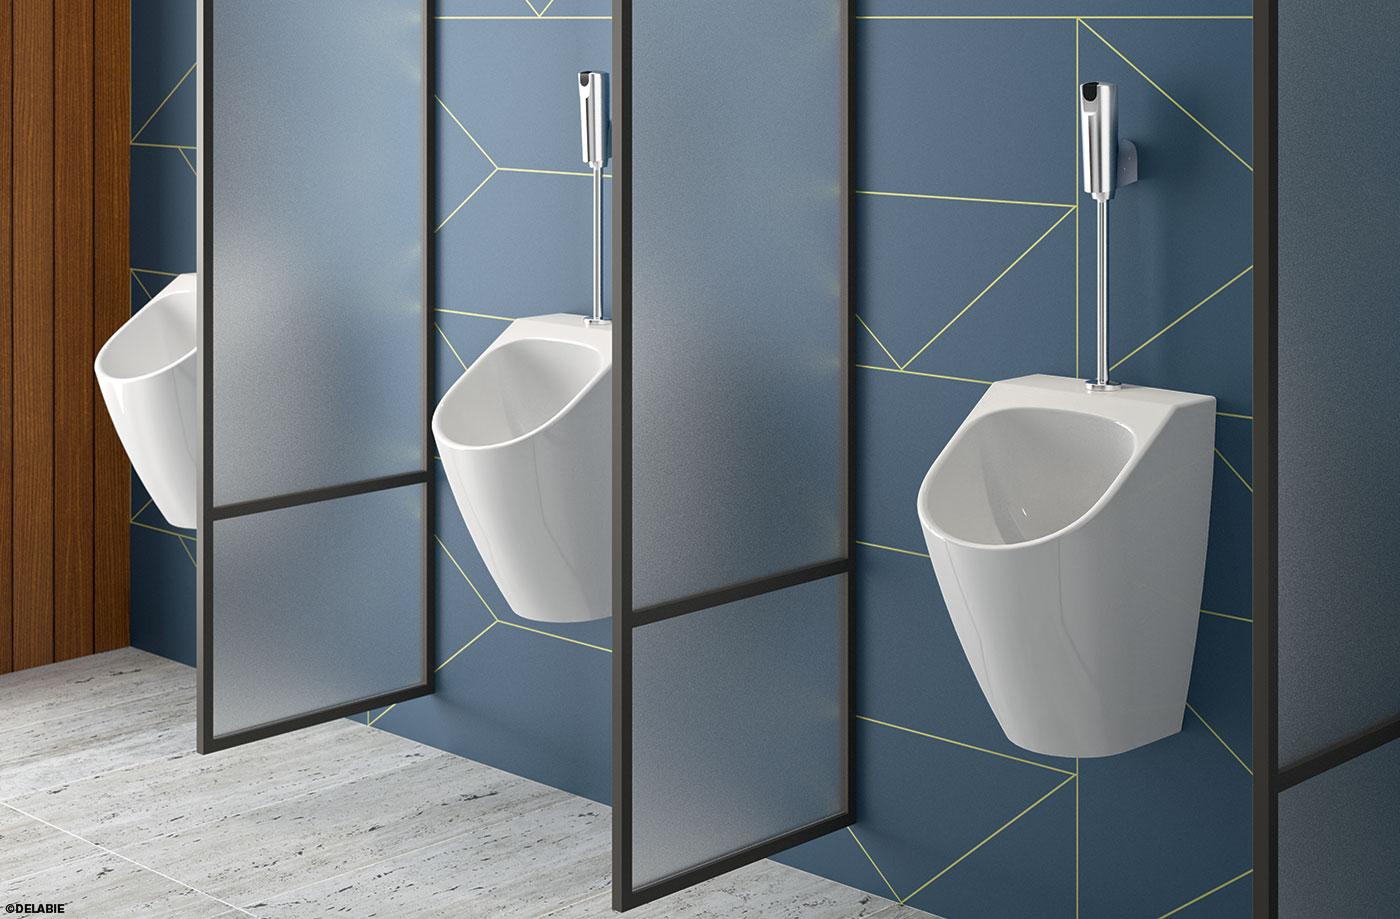 Public/Commercial urinals